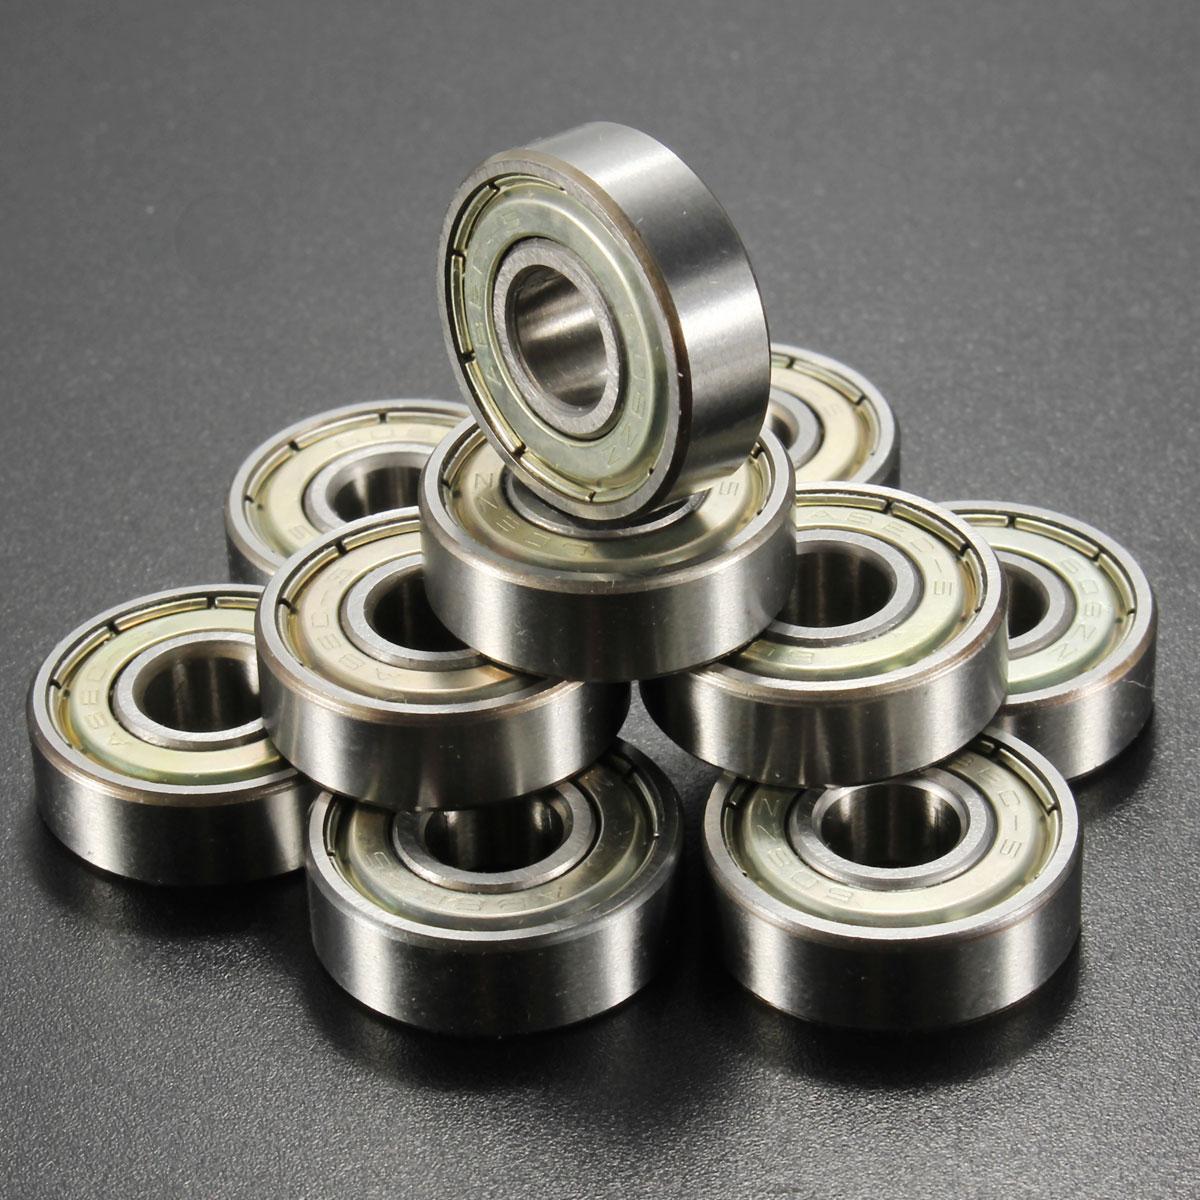 20pcs Double Shielded Miniature High carbon Steel Single Row 608ZZ Deep Groove Ball Bearing 8x22x7 mm